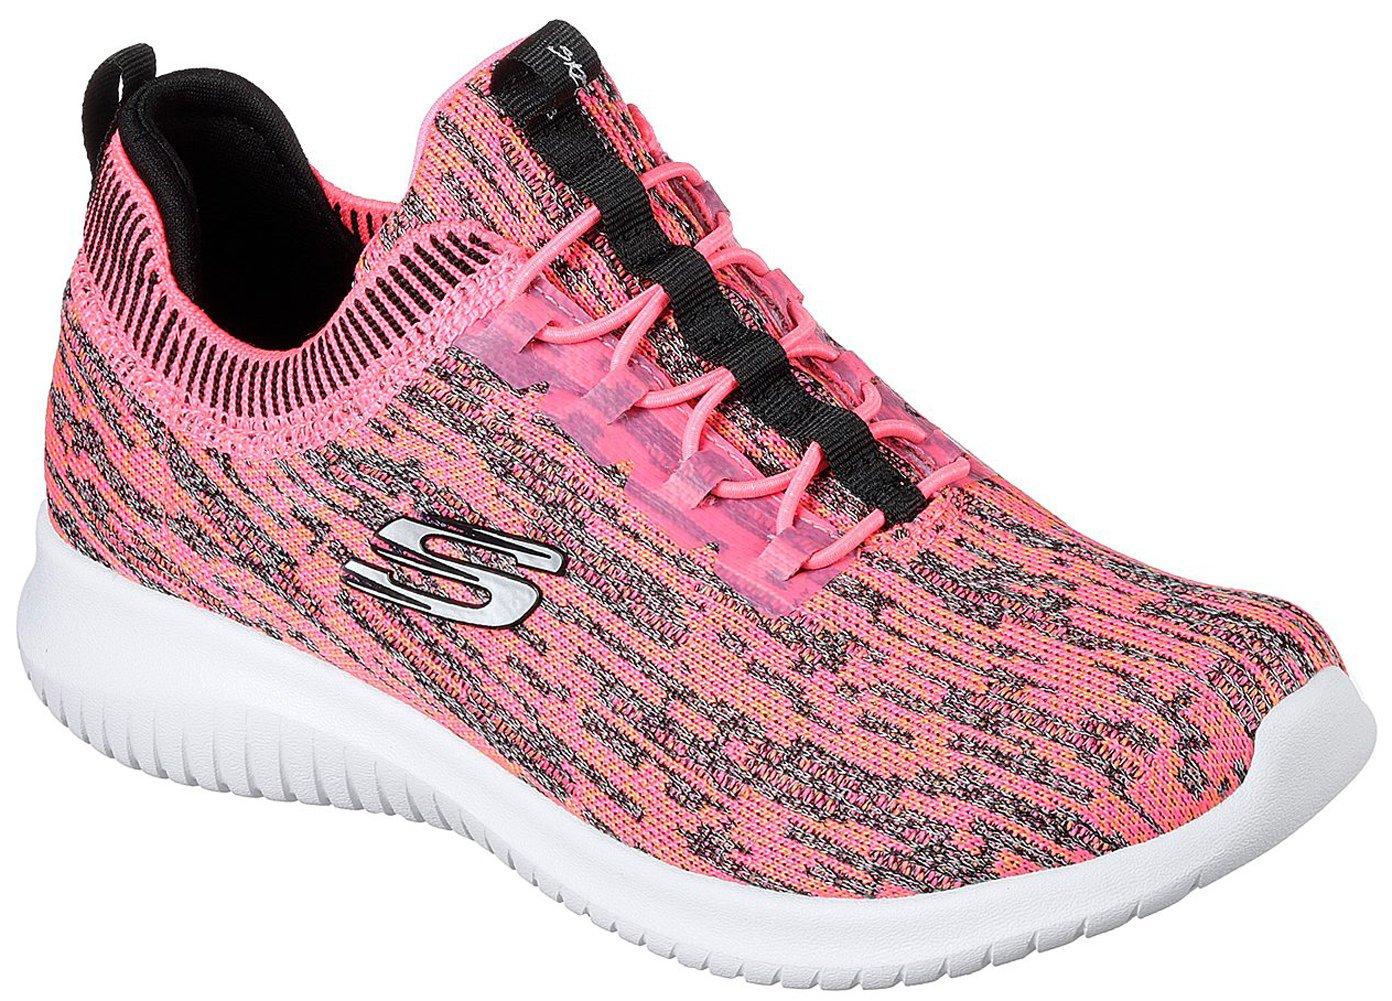 Skechers Sport Womens Ultra Flex Bright Horizon Sneaker,6.5 B(M) US,Pink-black